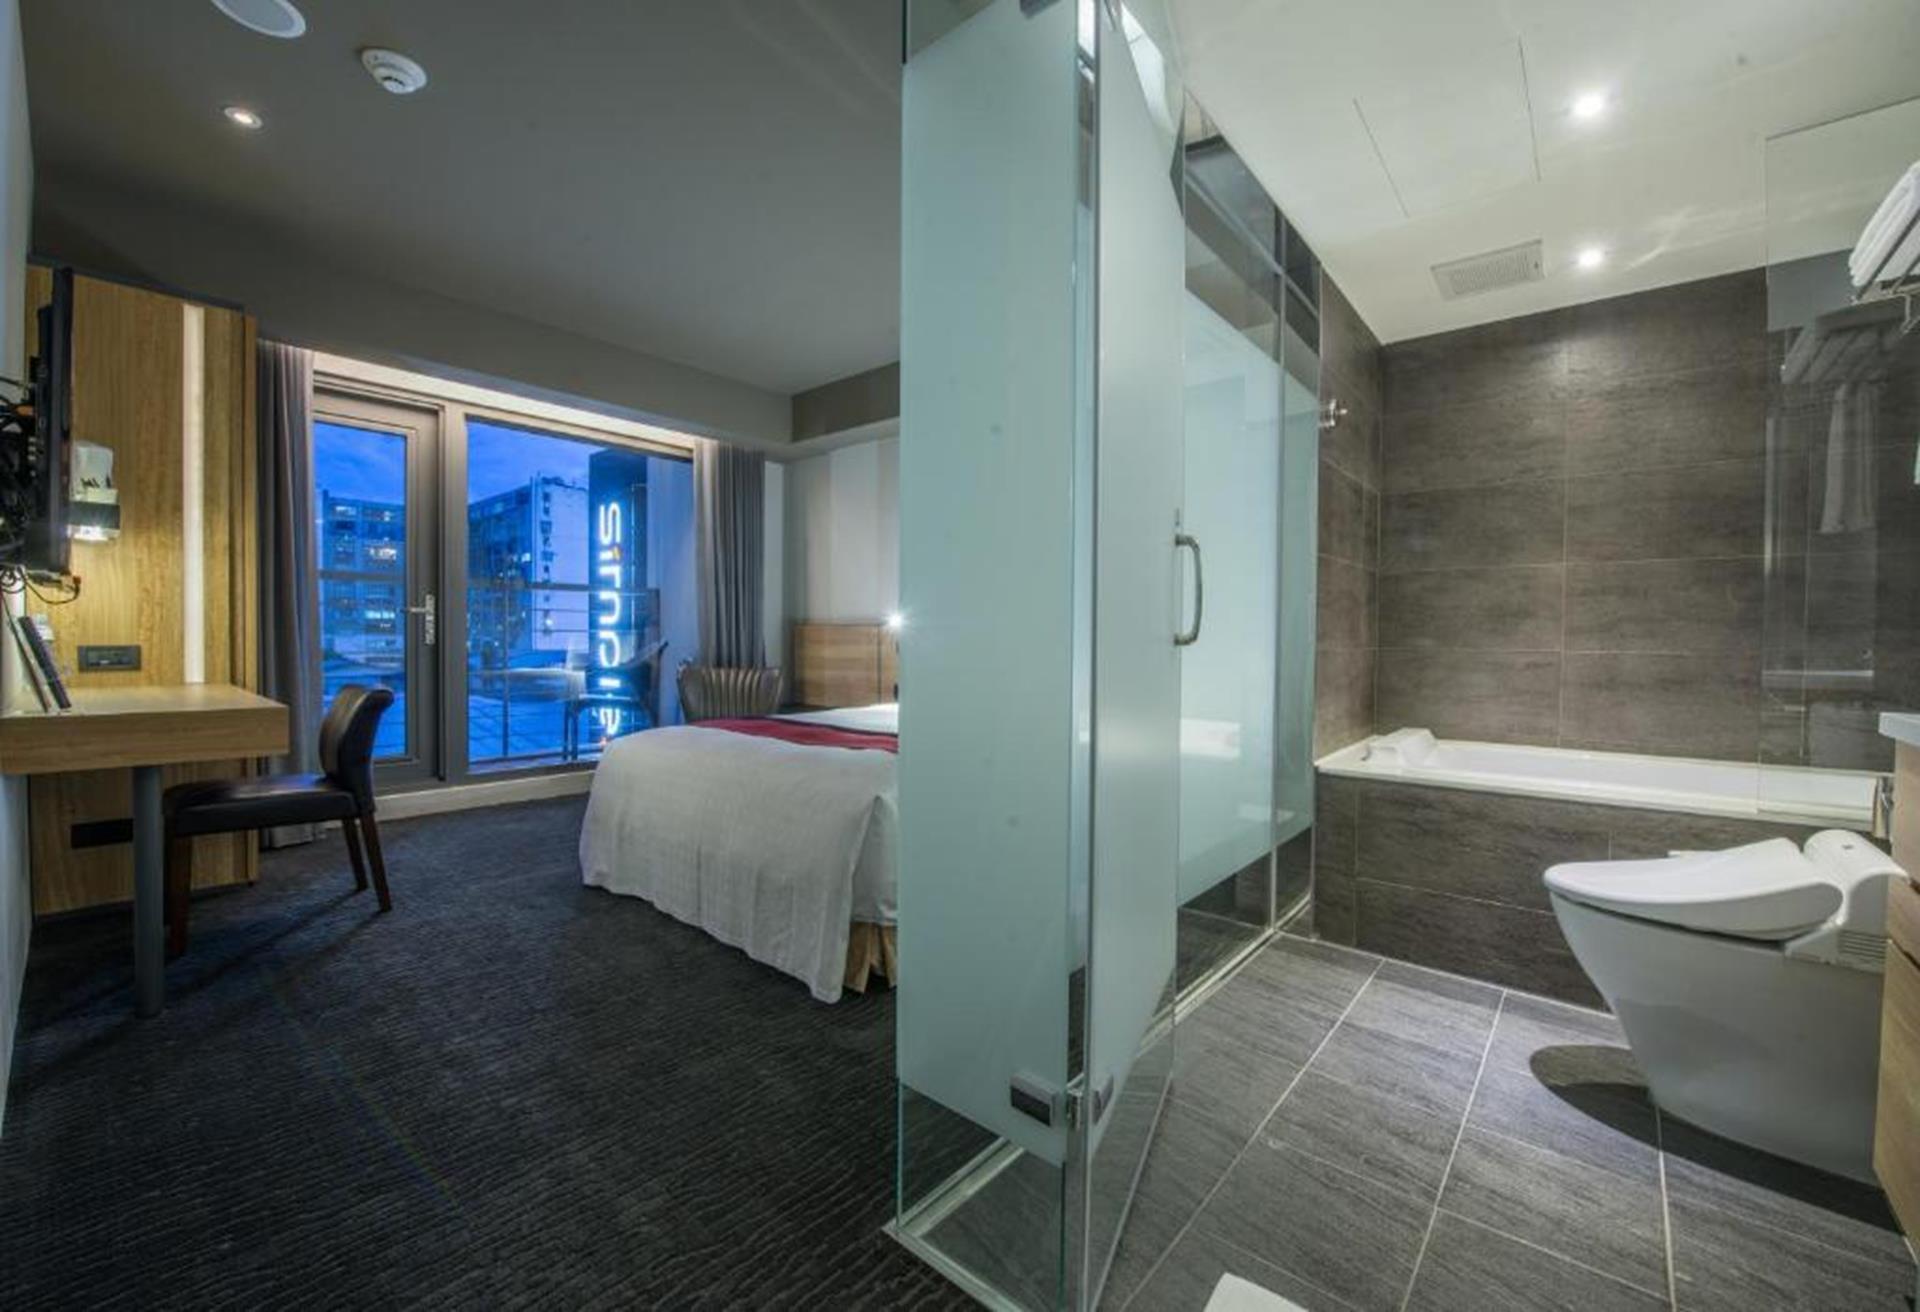 Simple+ 飯店,Simple Plus,台北捷運住宿,台北 捷運 飯店,台北 捷運住宿